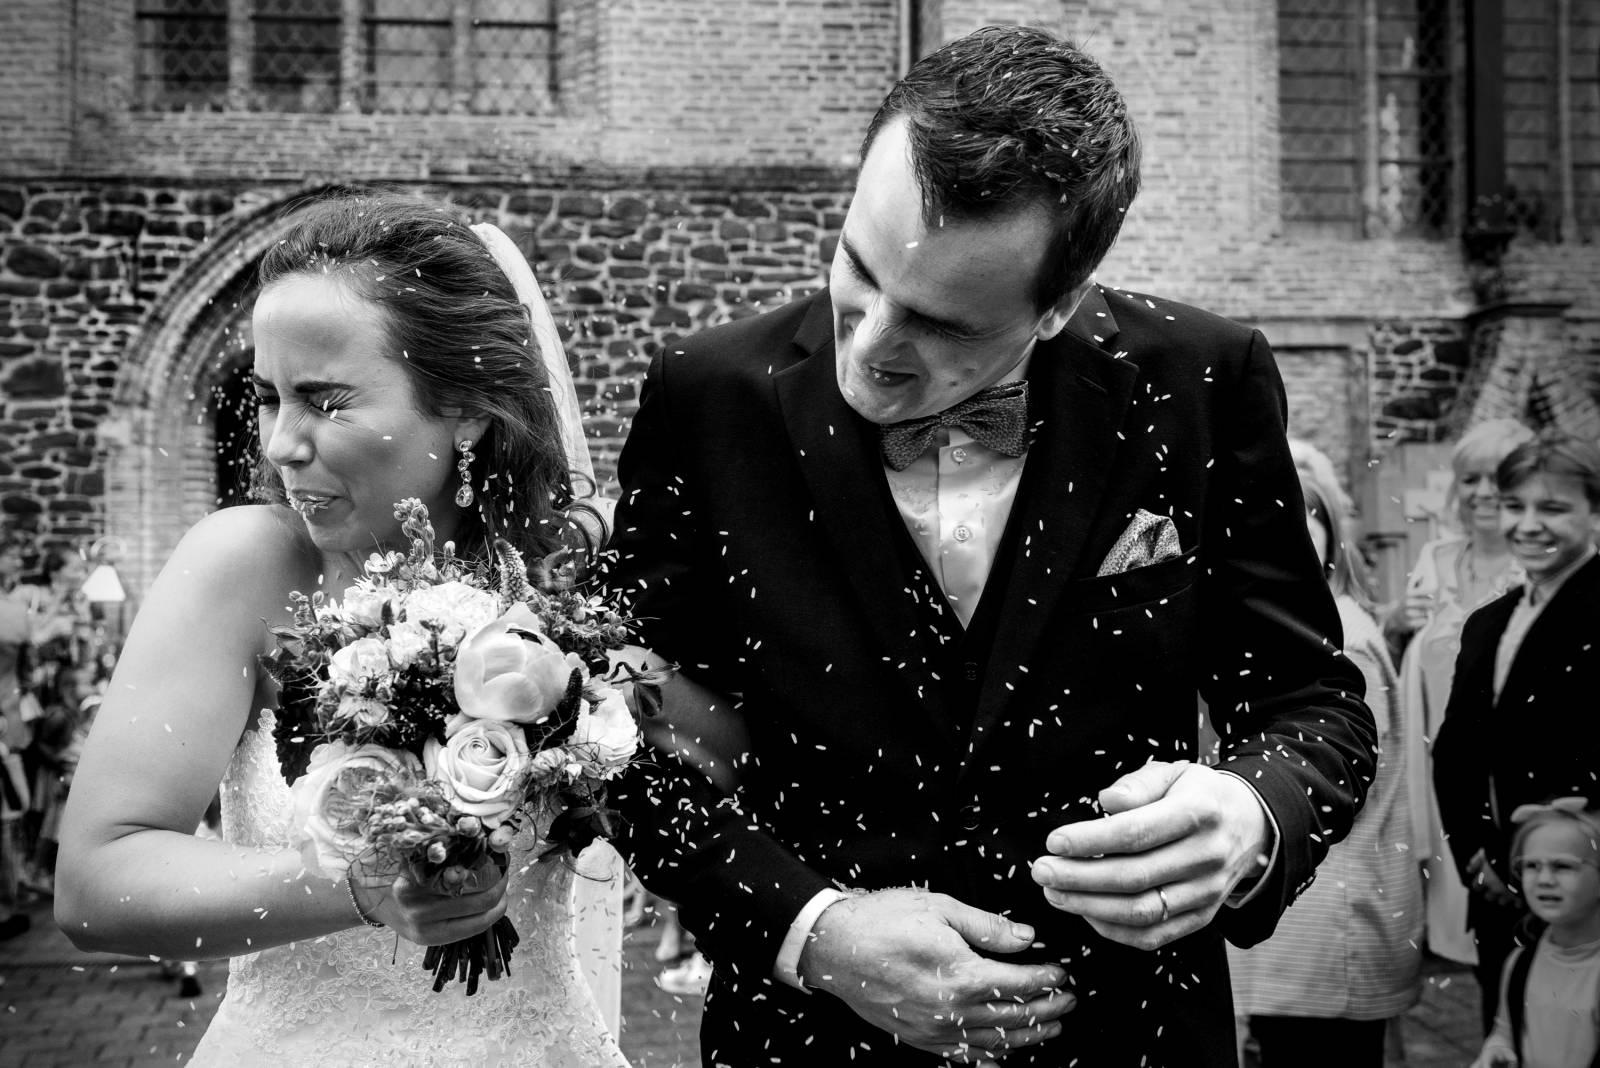 Fotografie Melody - Huwelijksfotograaf - Trouwfotograaf - House of Weddings - 21